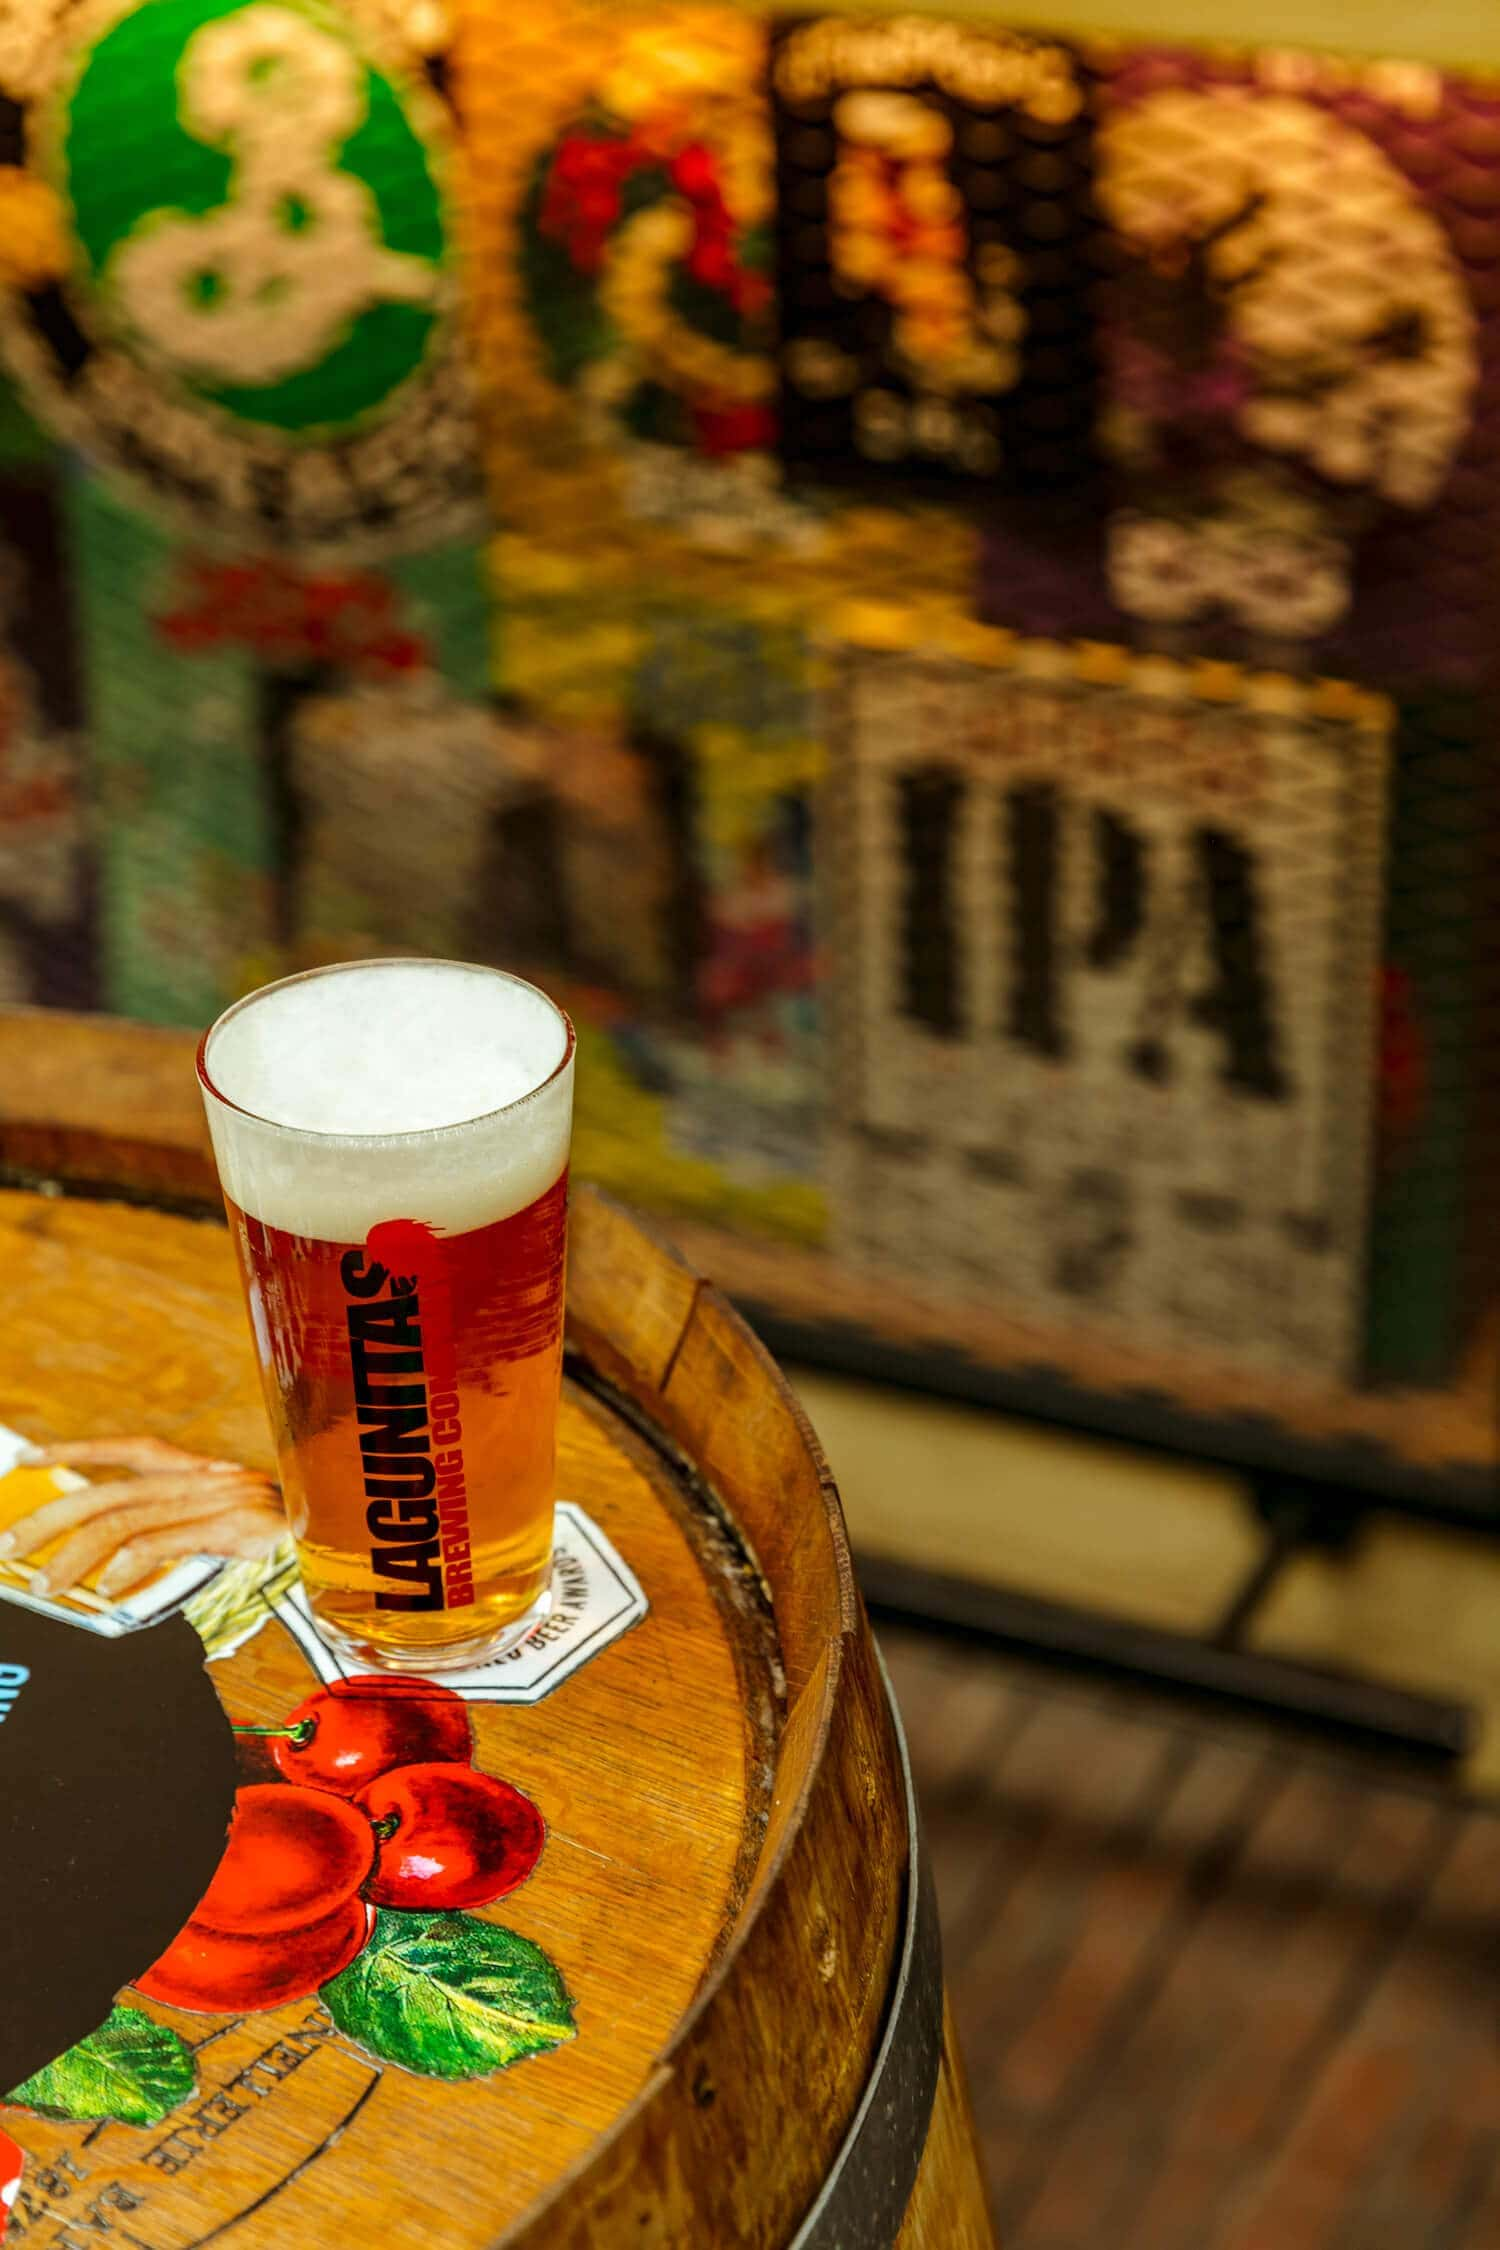 Bier Fotografie Amsterdam